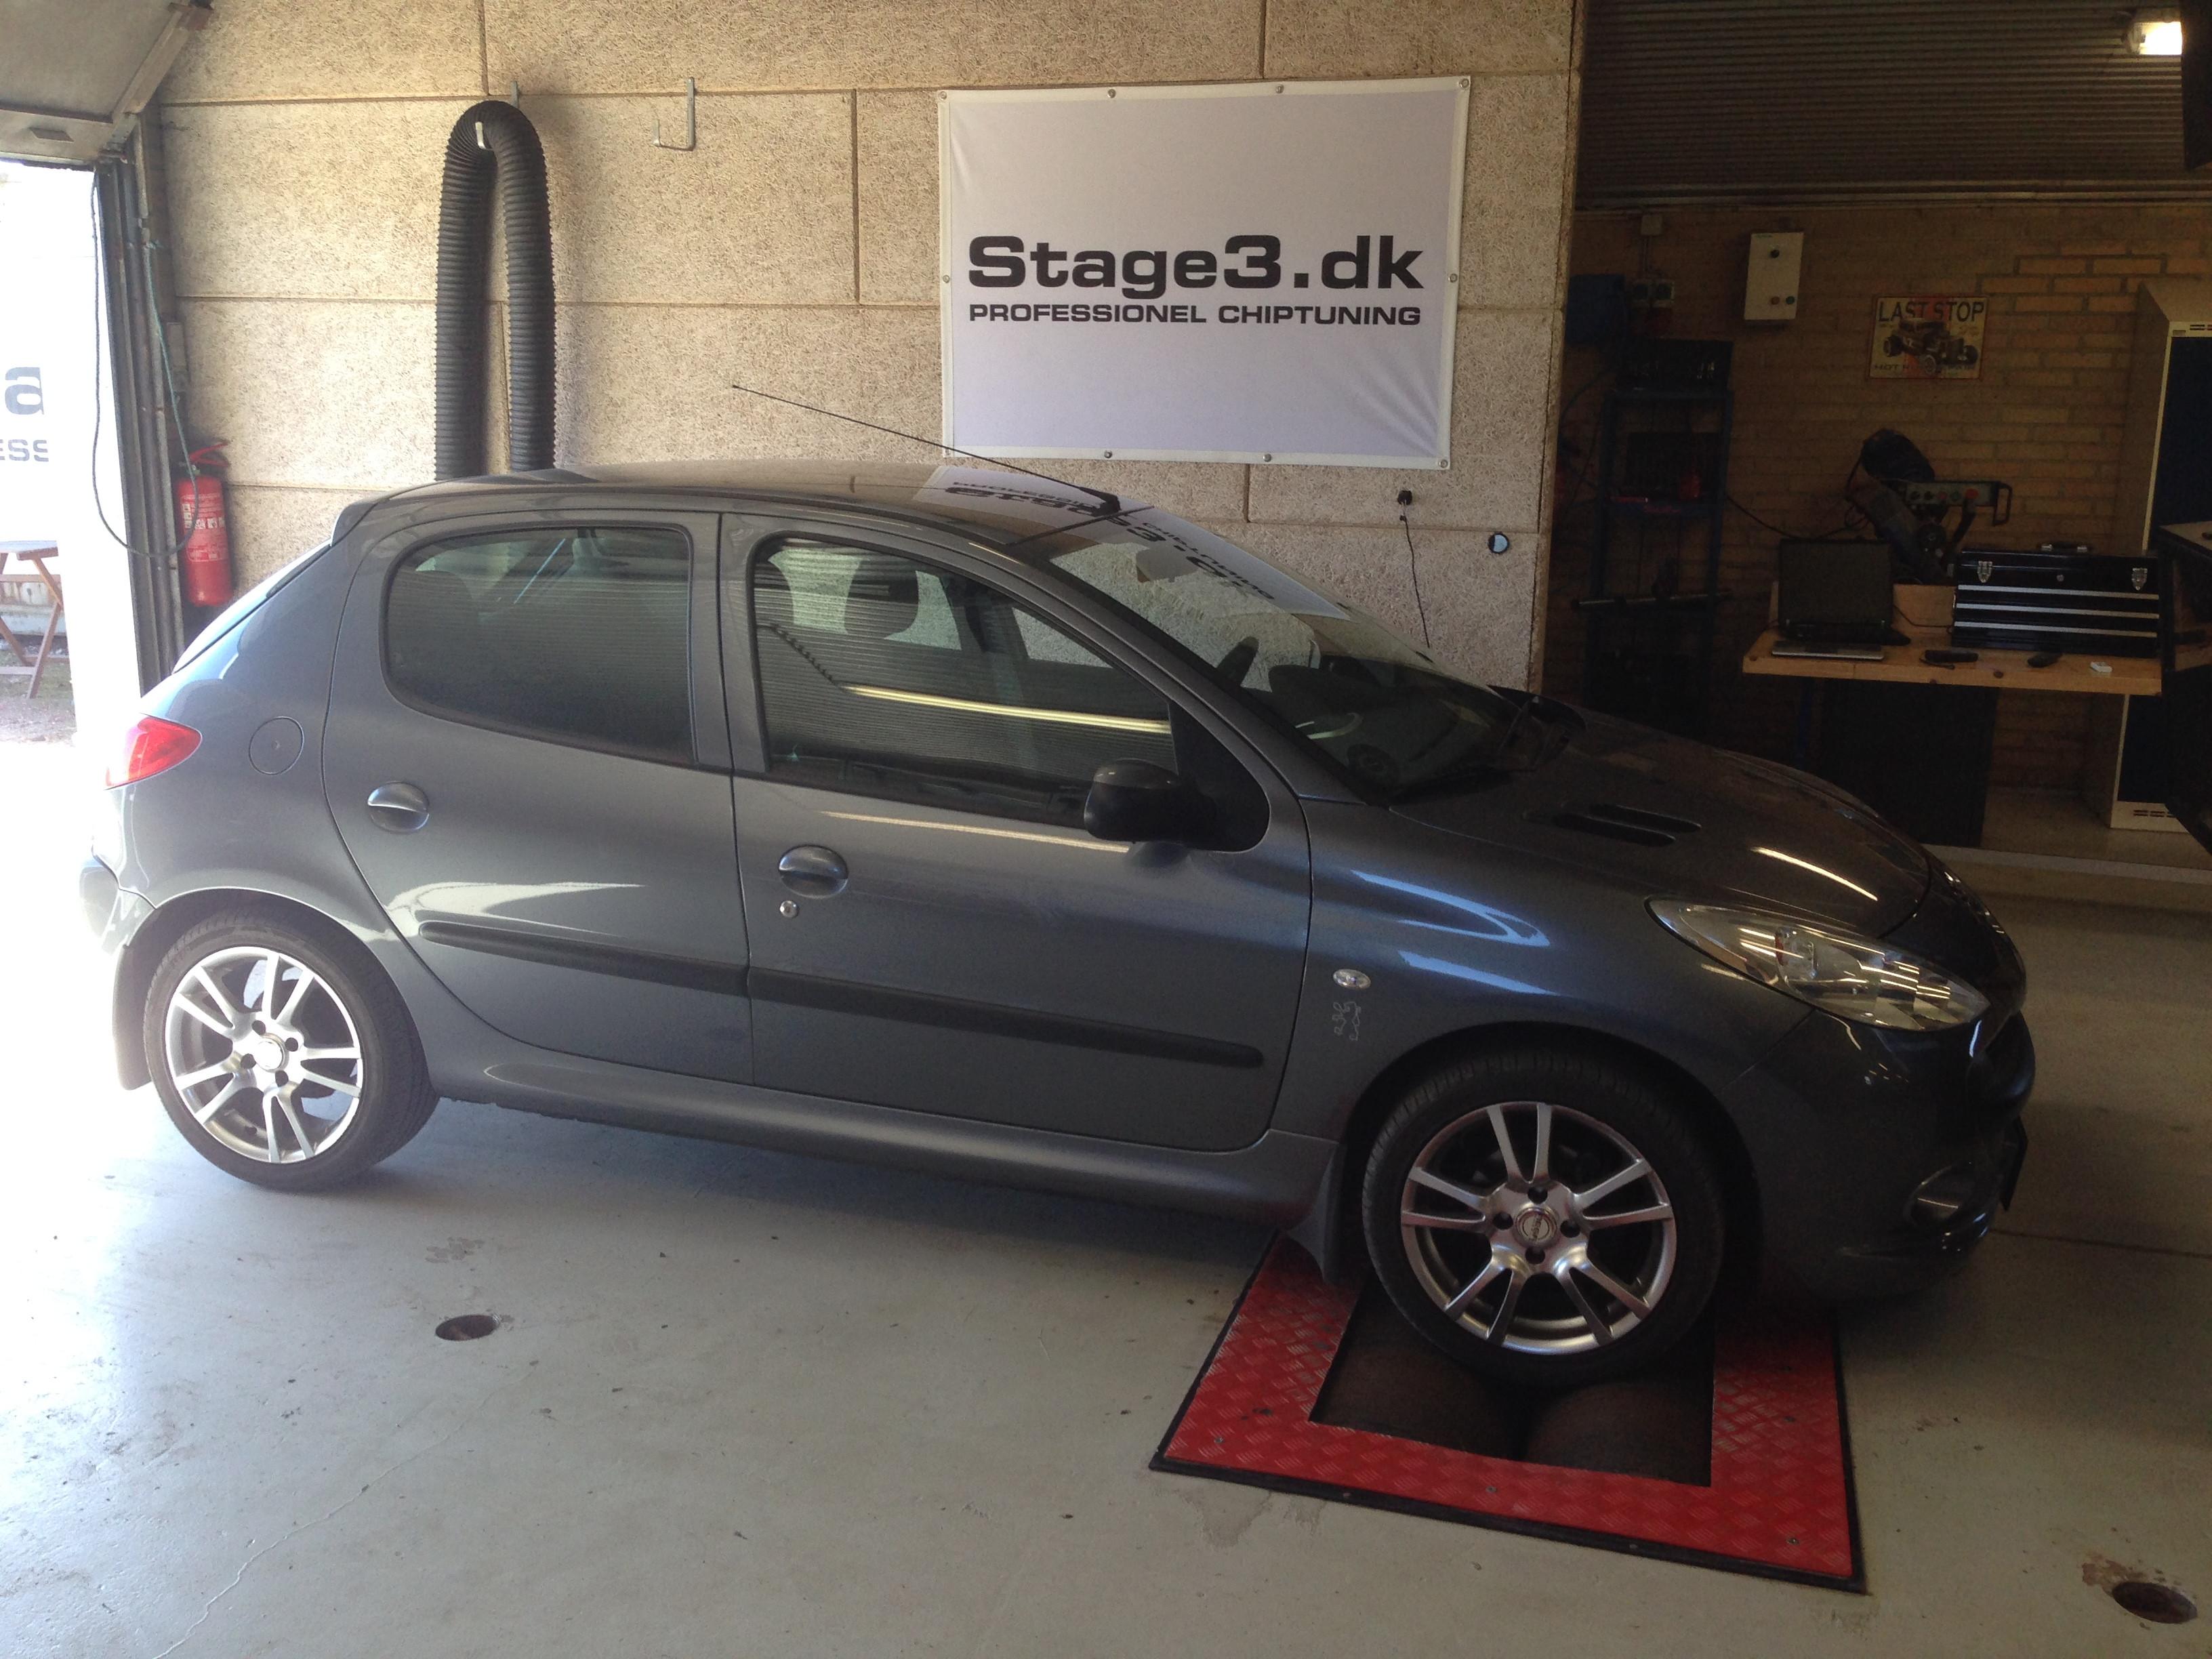 Peugeot 206+ chiptuning